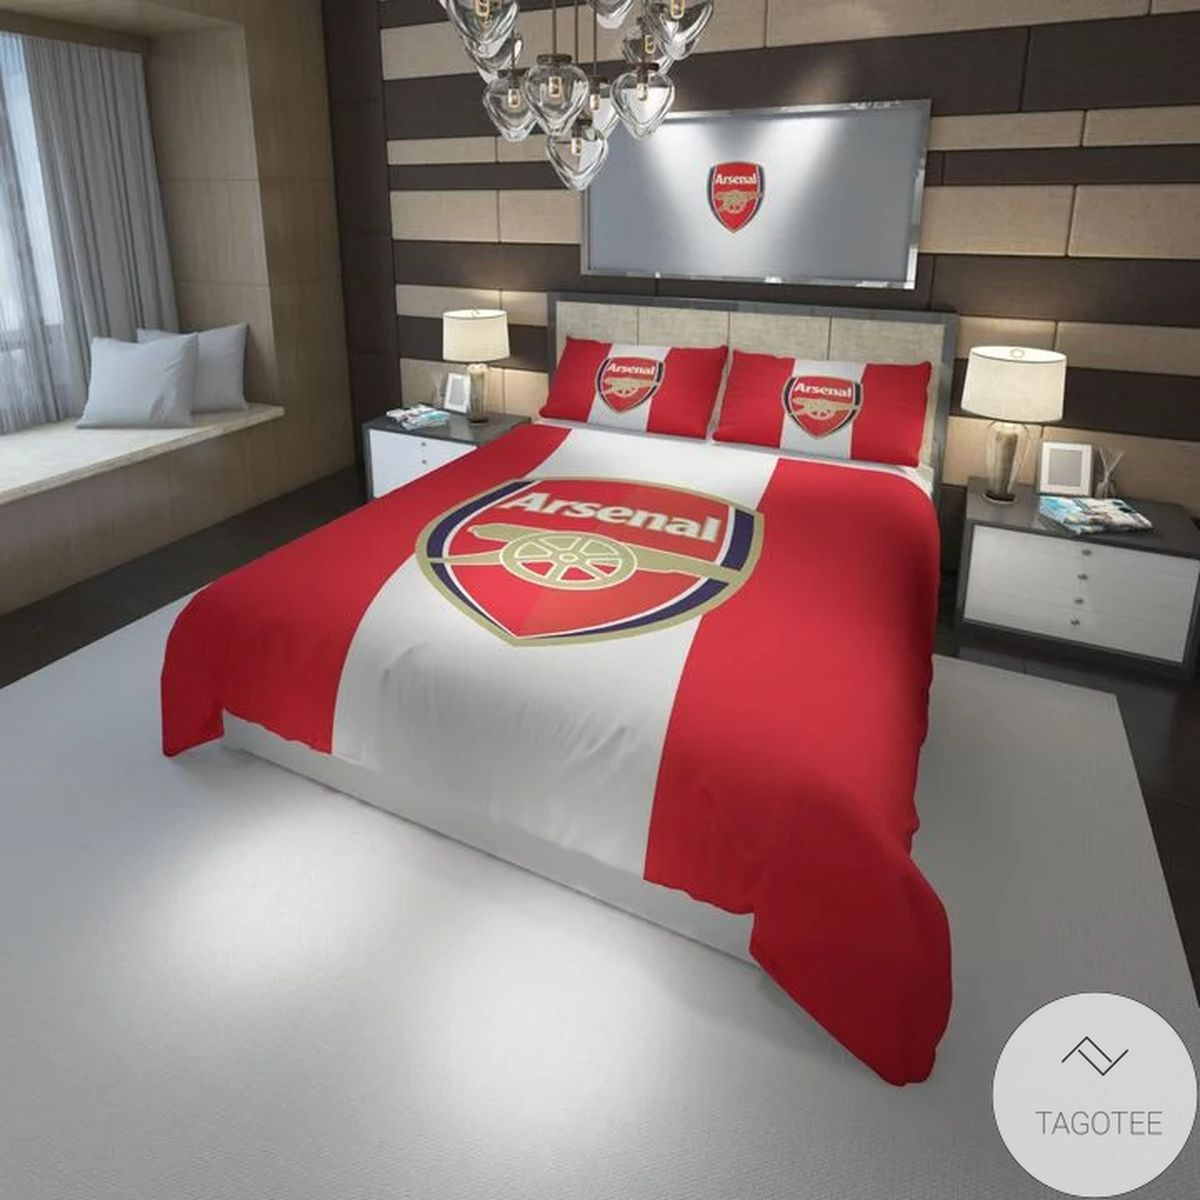 Arsenal Fc Football Club Bedding Set